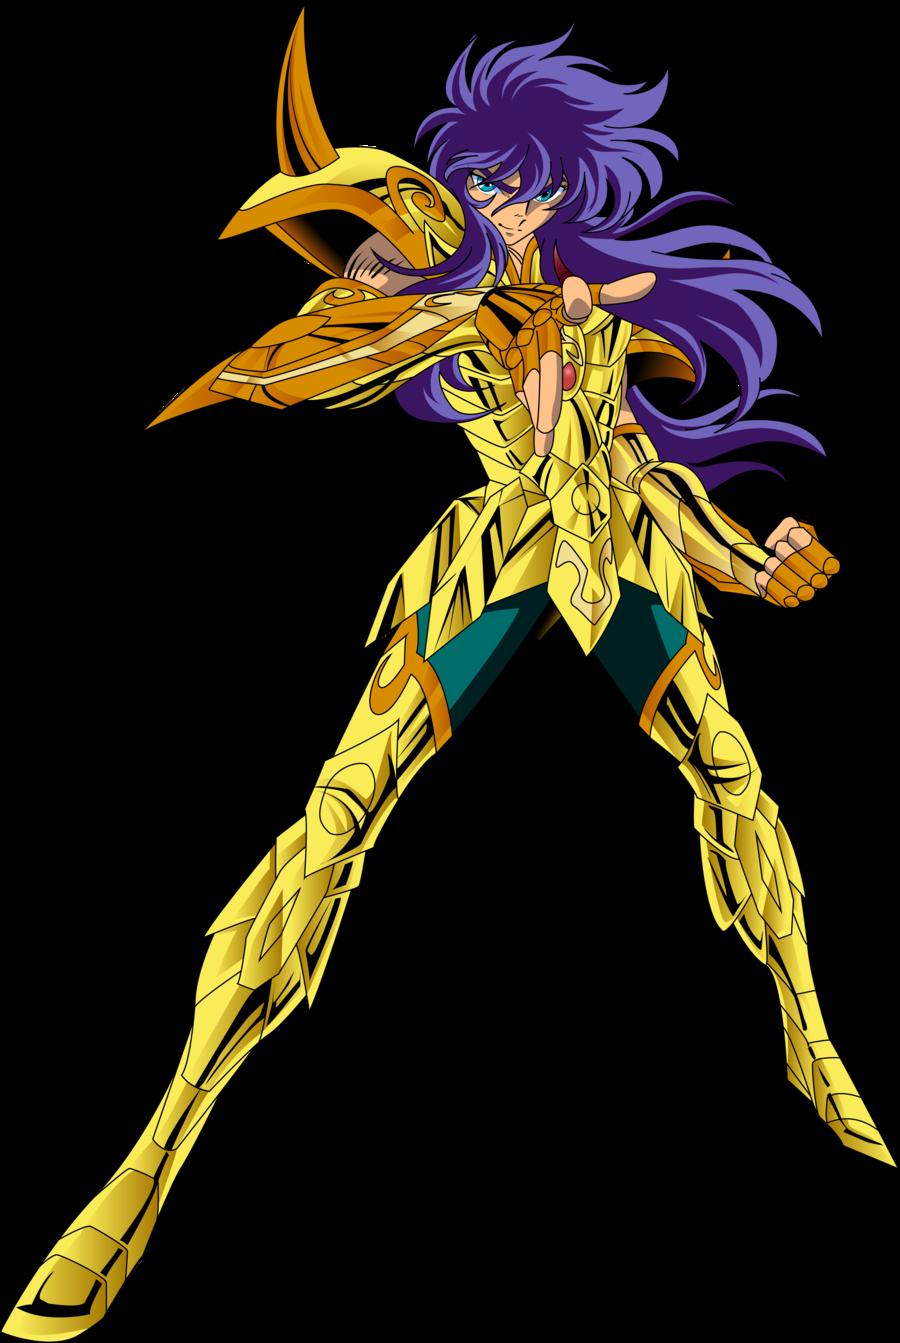 Dibujo De Un Escorpion Dorado milo de escorpio. caballero dorado. saint seiya (png